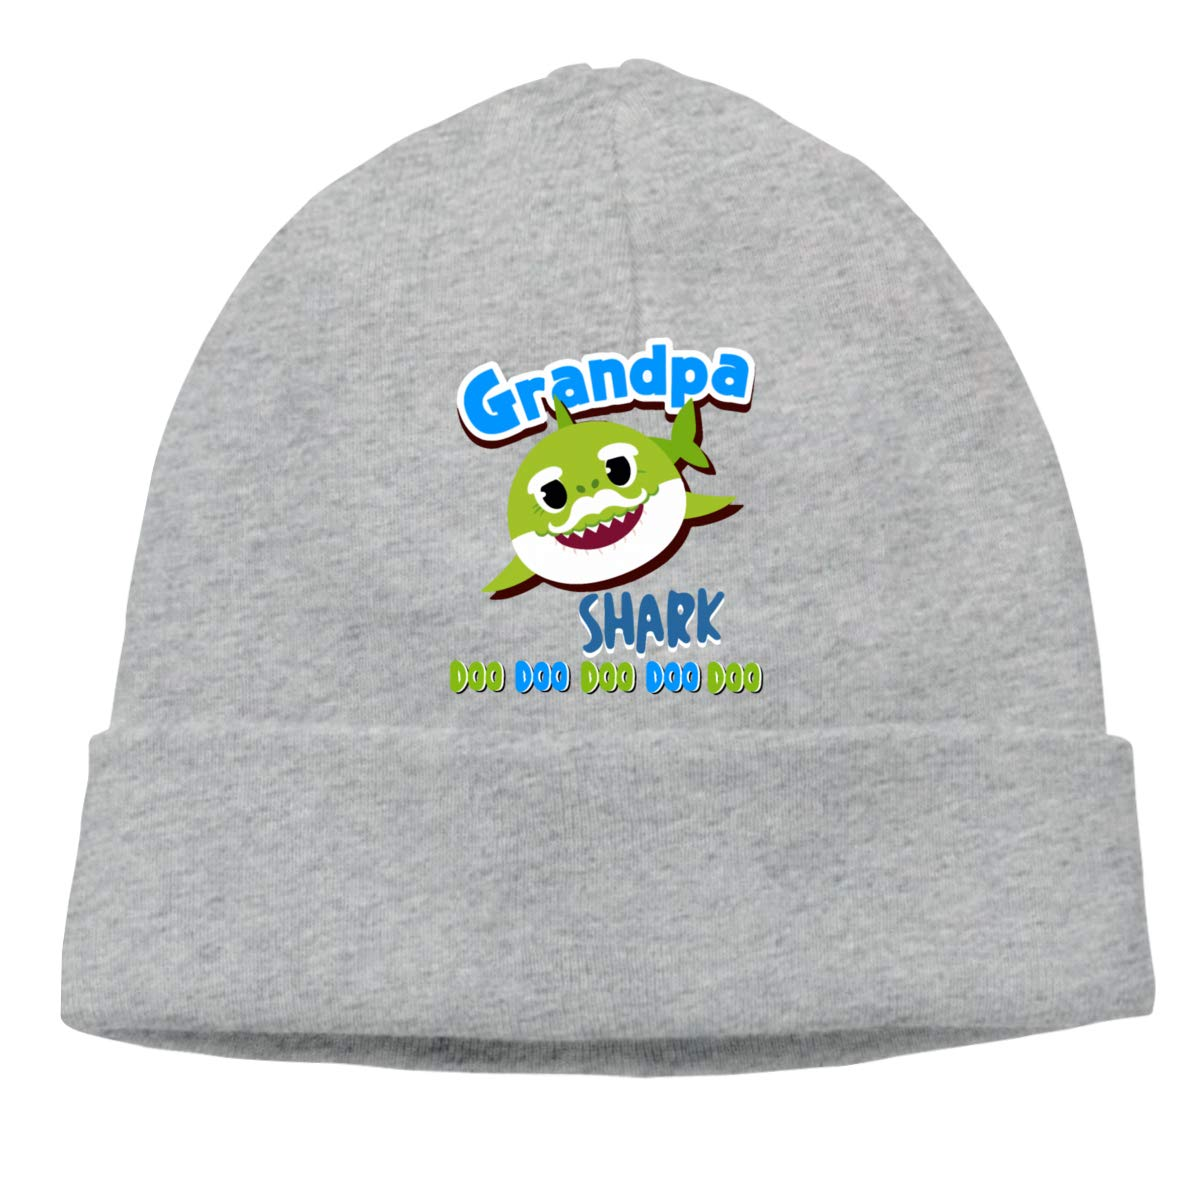 Grandpa Shark Thin Beanie Hat Skull Caps Men/&Women Slouchy Soft